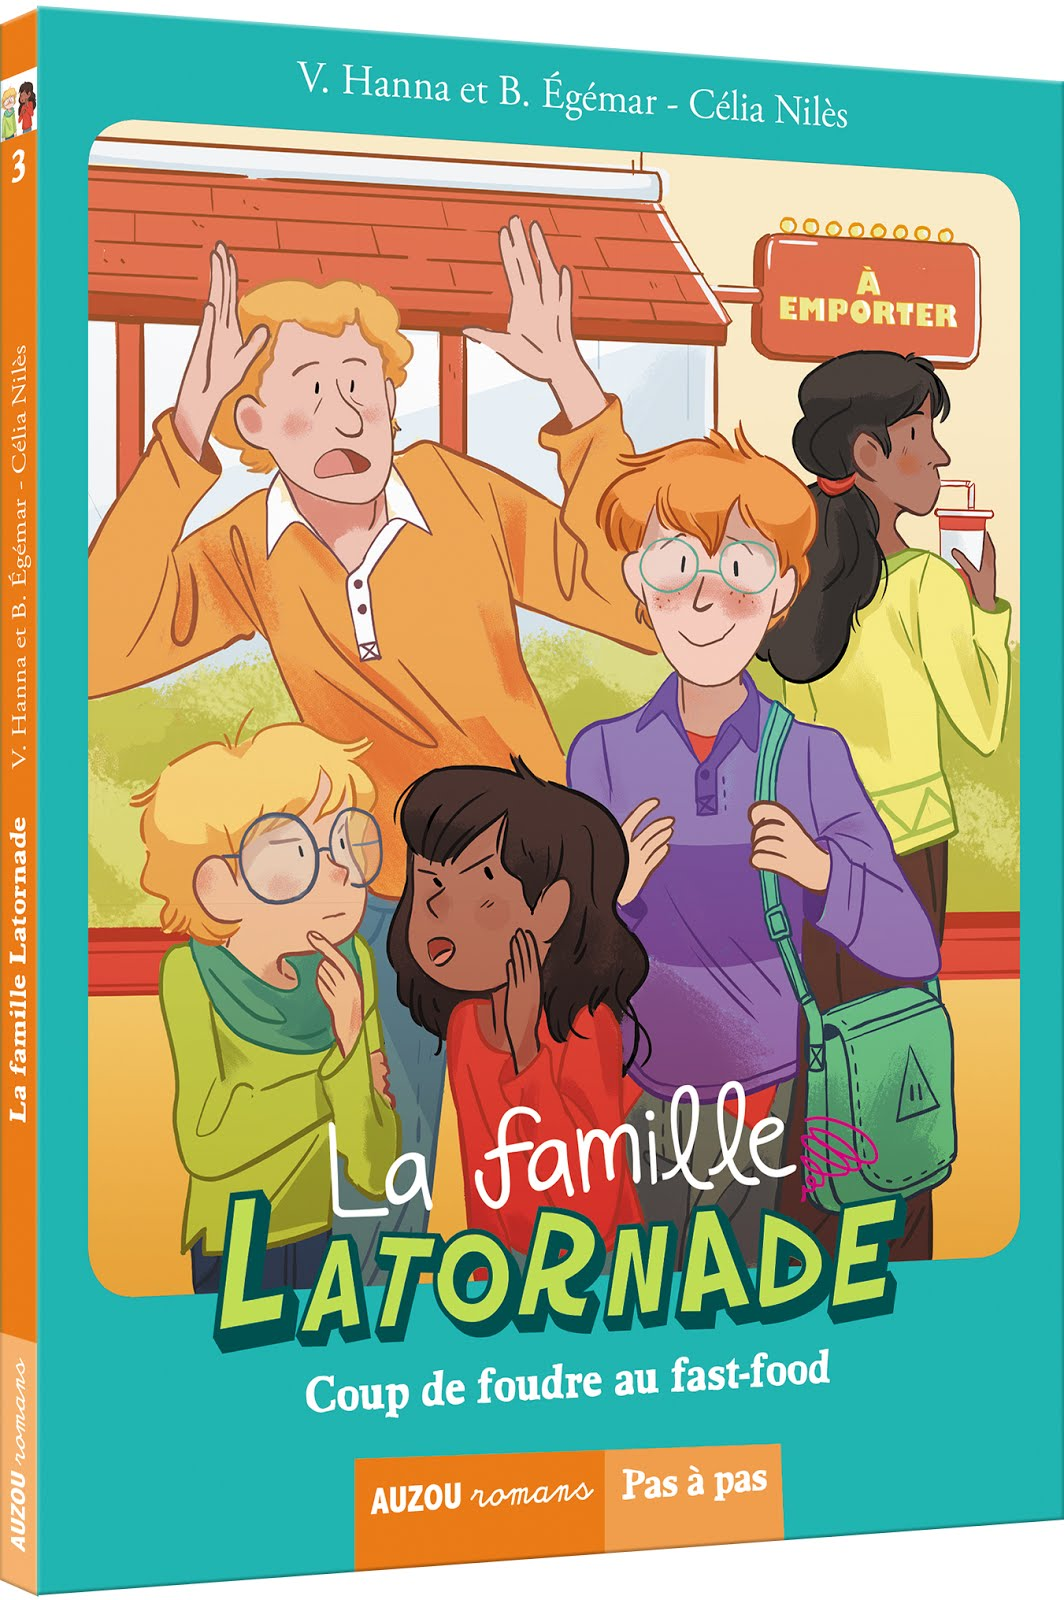 La Famille Latornade, Coup de foudre au fast food